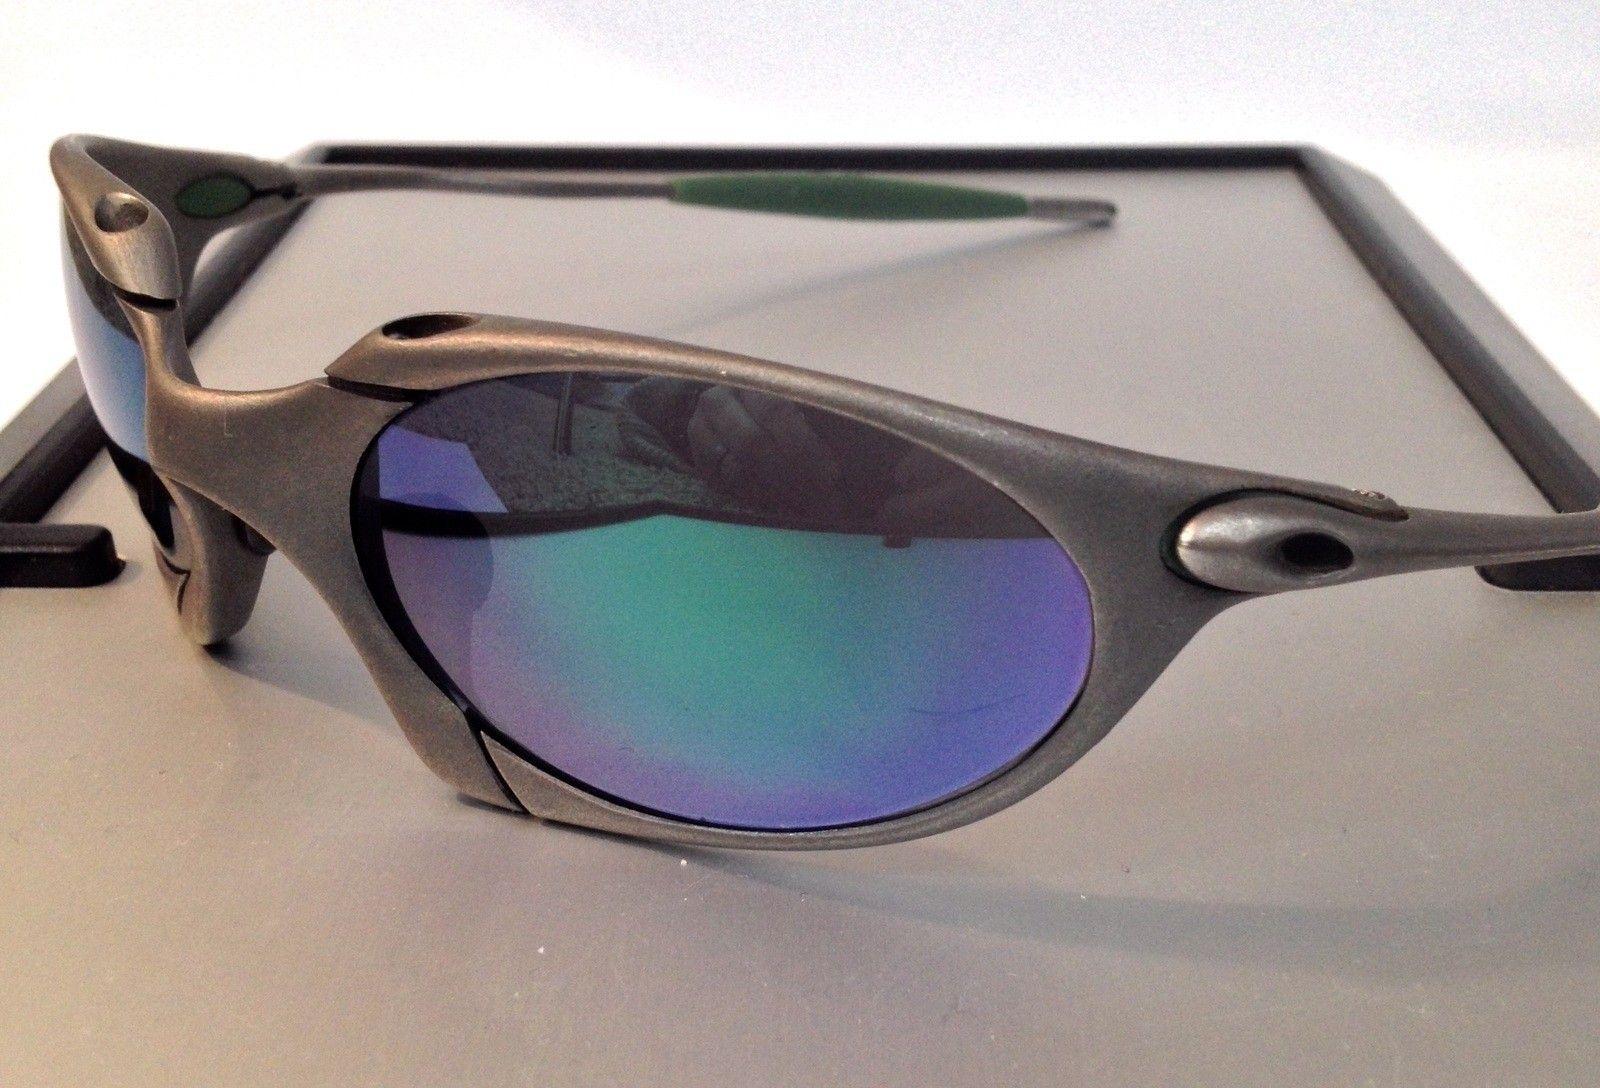 Romeo 1 with Jade lenses, go Plasma or Xmetal? - image.jpg